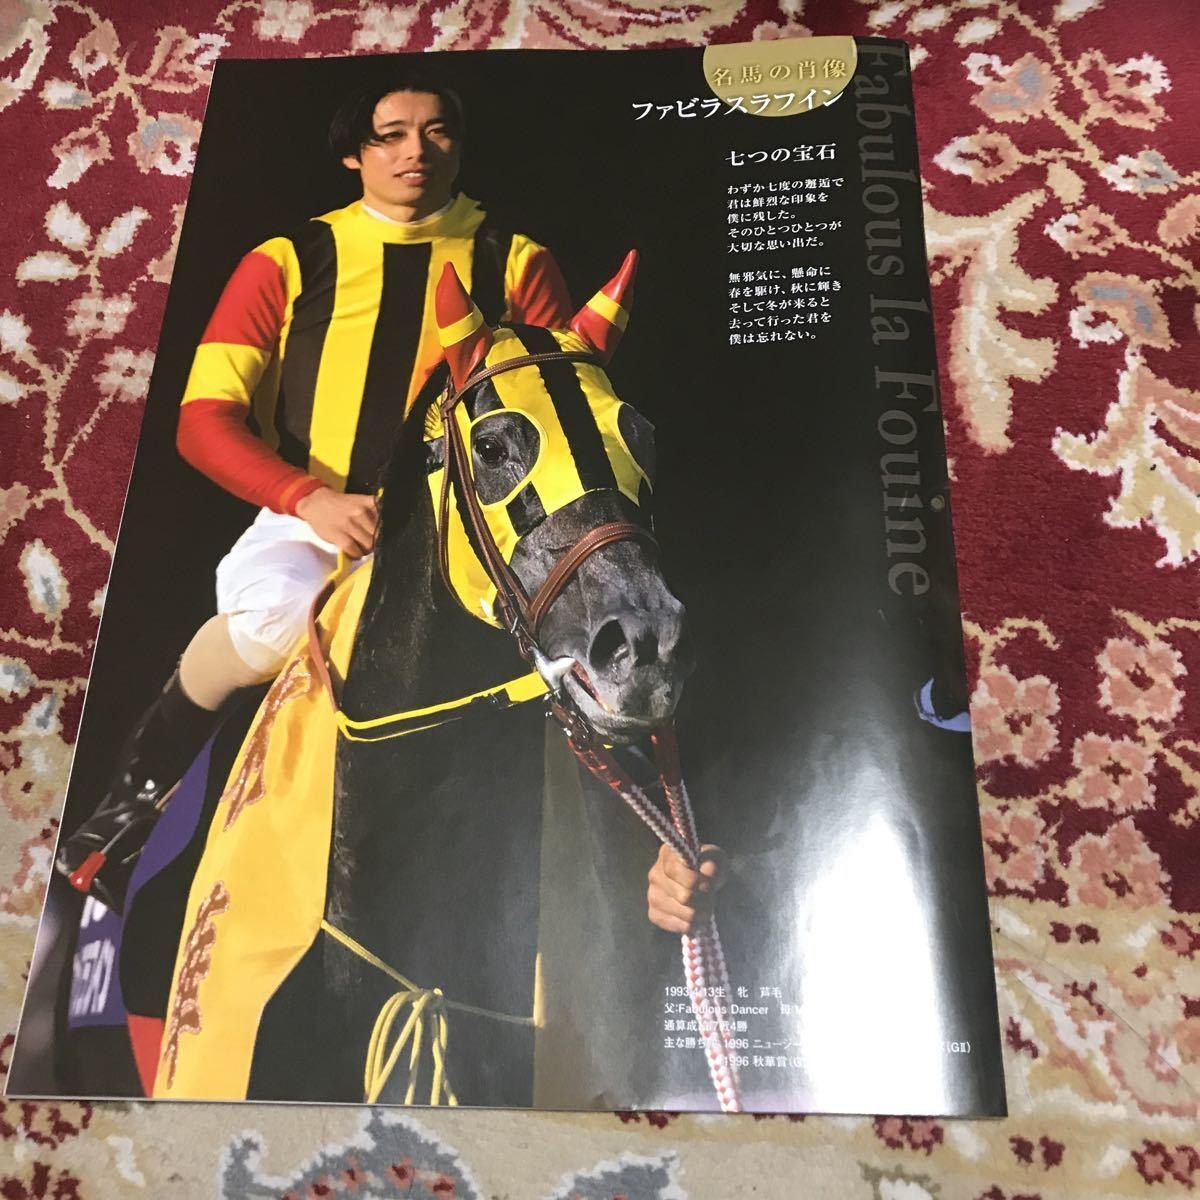 JRAレーシングプログラム2018.10.13。府中牝馬ステークス(GⅡ)、他_画像2